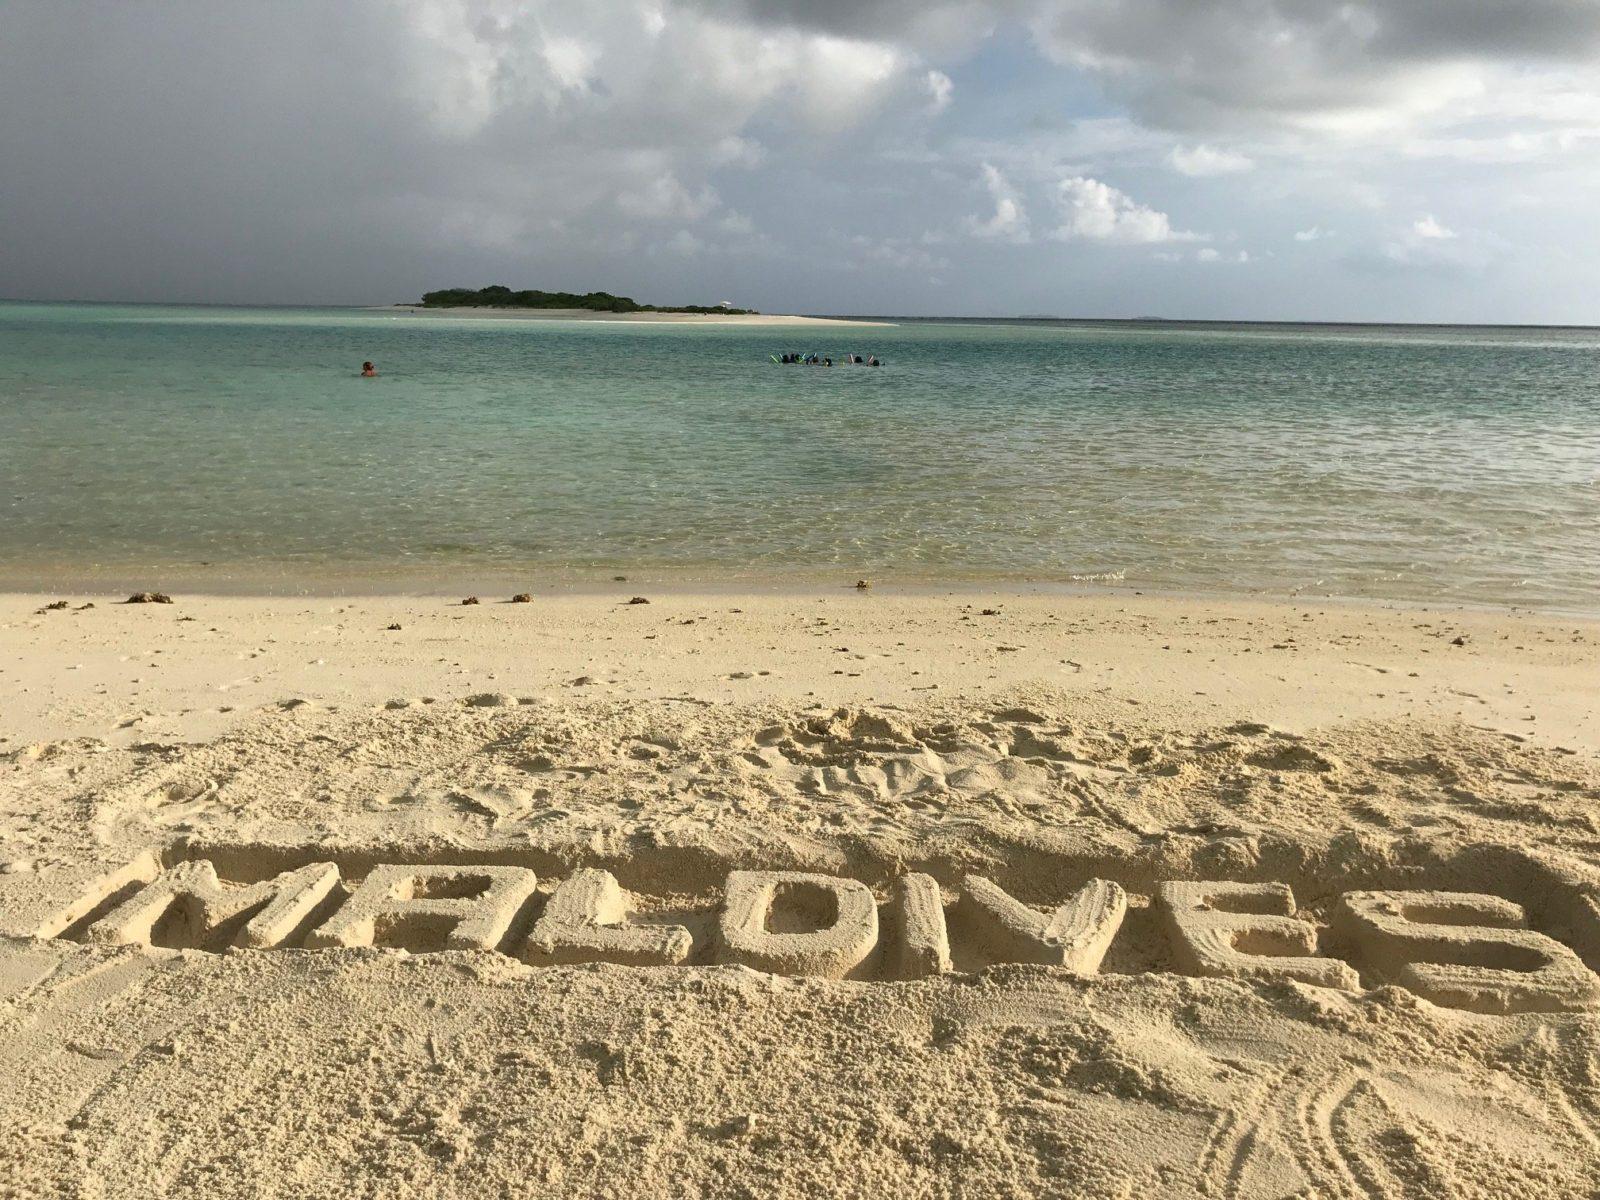 пляж острова Мативери на Мальдивах